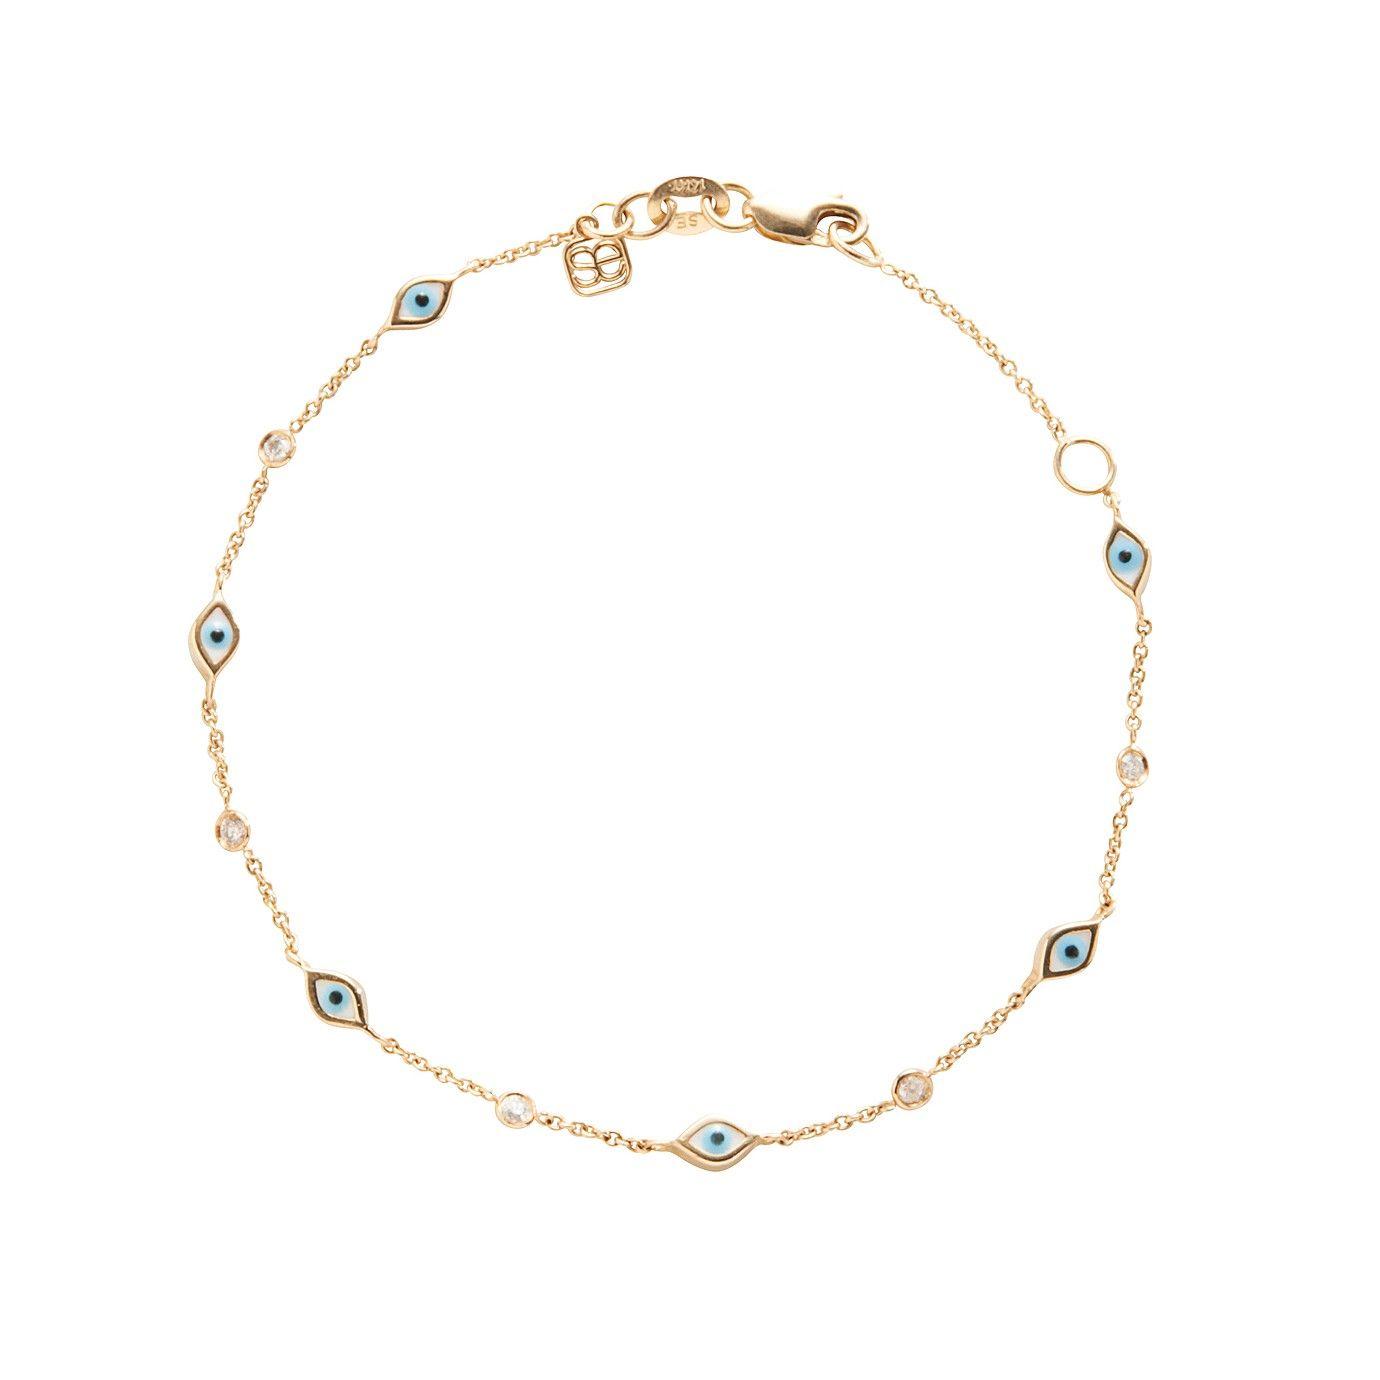 Sydney Evan Continuous Eye Link Bracelet SeCud